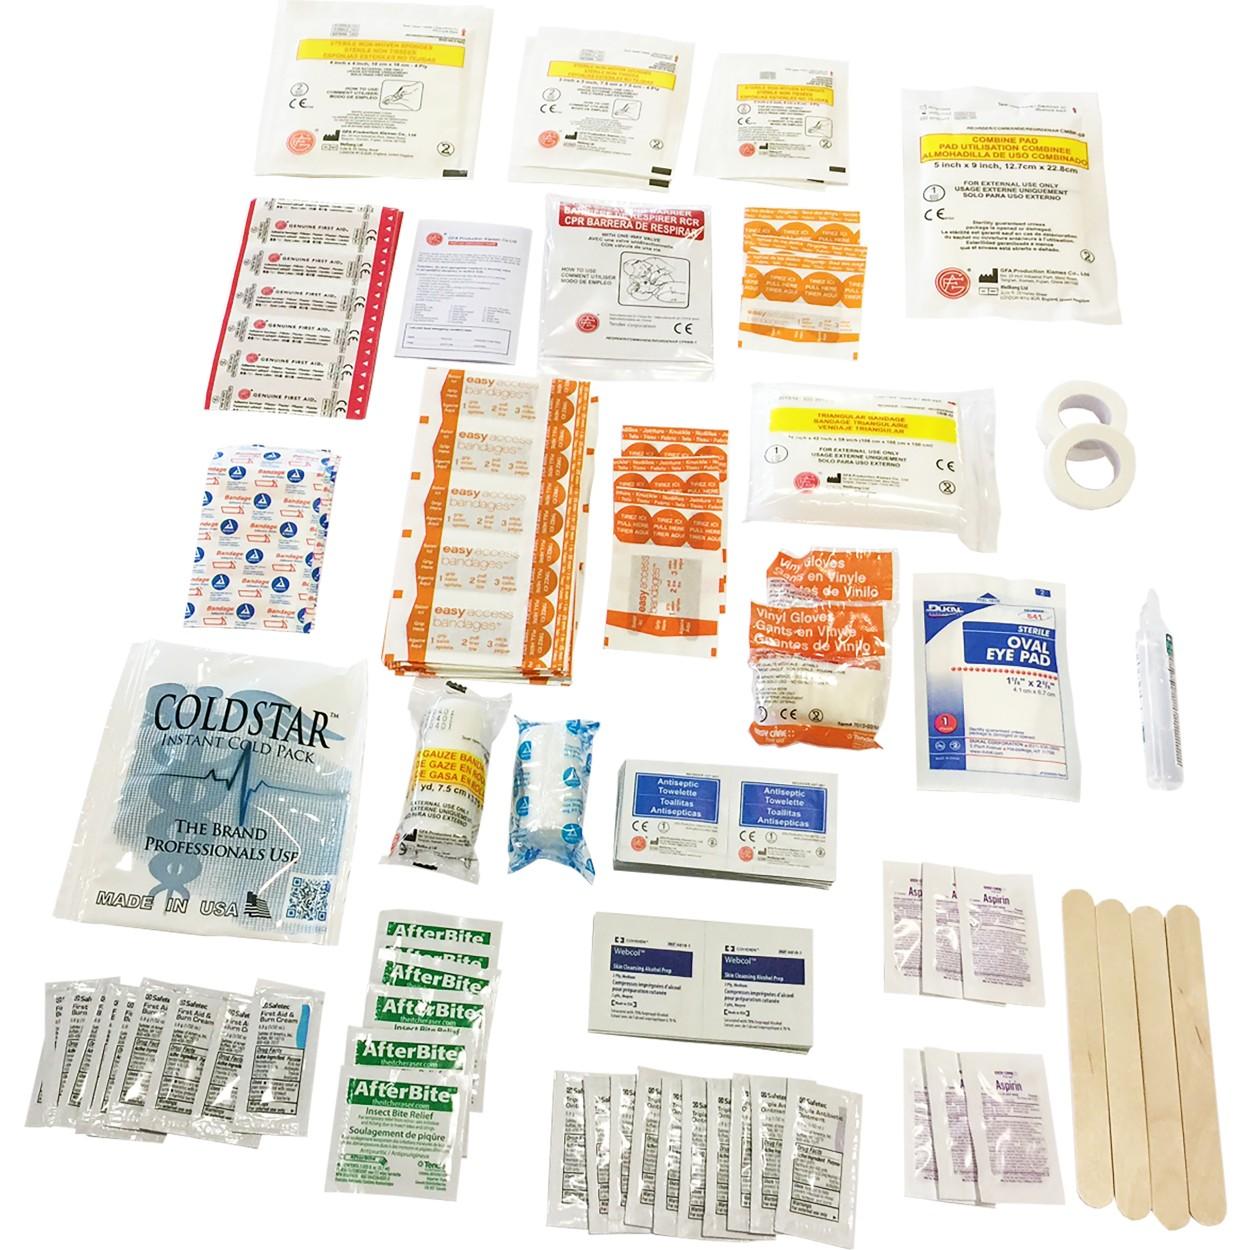 50 Person ANSI 2009 Bulk Plastic First Aid Kit - 2009 ANSI